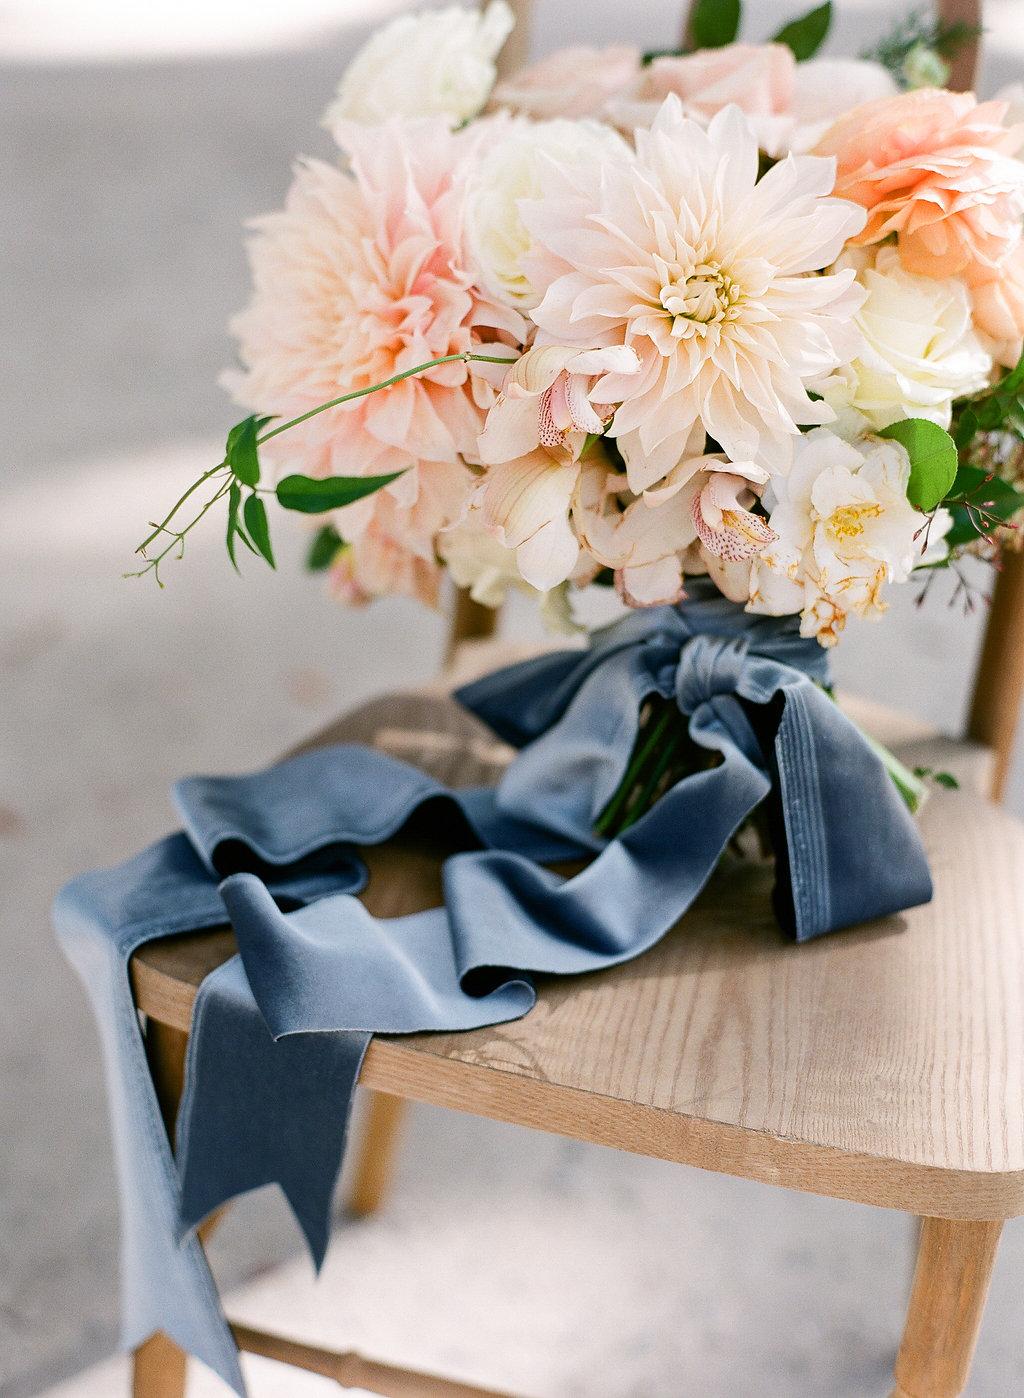 the-happy-bloom-wormsloe-wedding-savannah-wedding-ivory-and-beau-bridal-boutique-savannah-wedding-dresses-savannah-bridal-boutique-georgia-bridal-boutique-design-studio-south-sunset-wedding-blush-by-hayley-paige-candi-1550-blush-wedding-dress-5.jpg